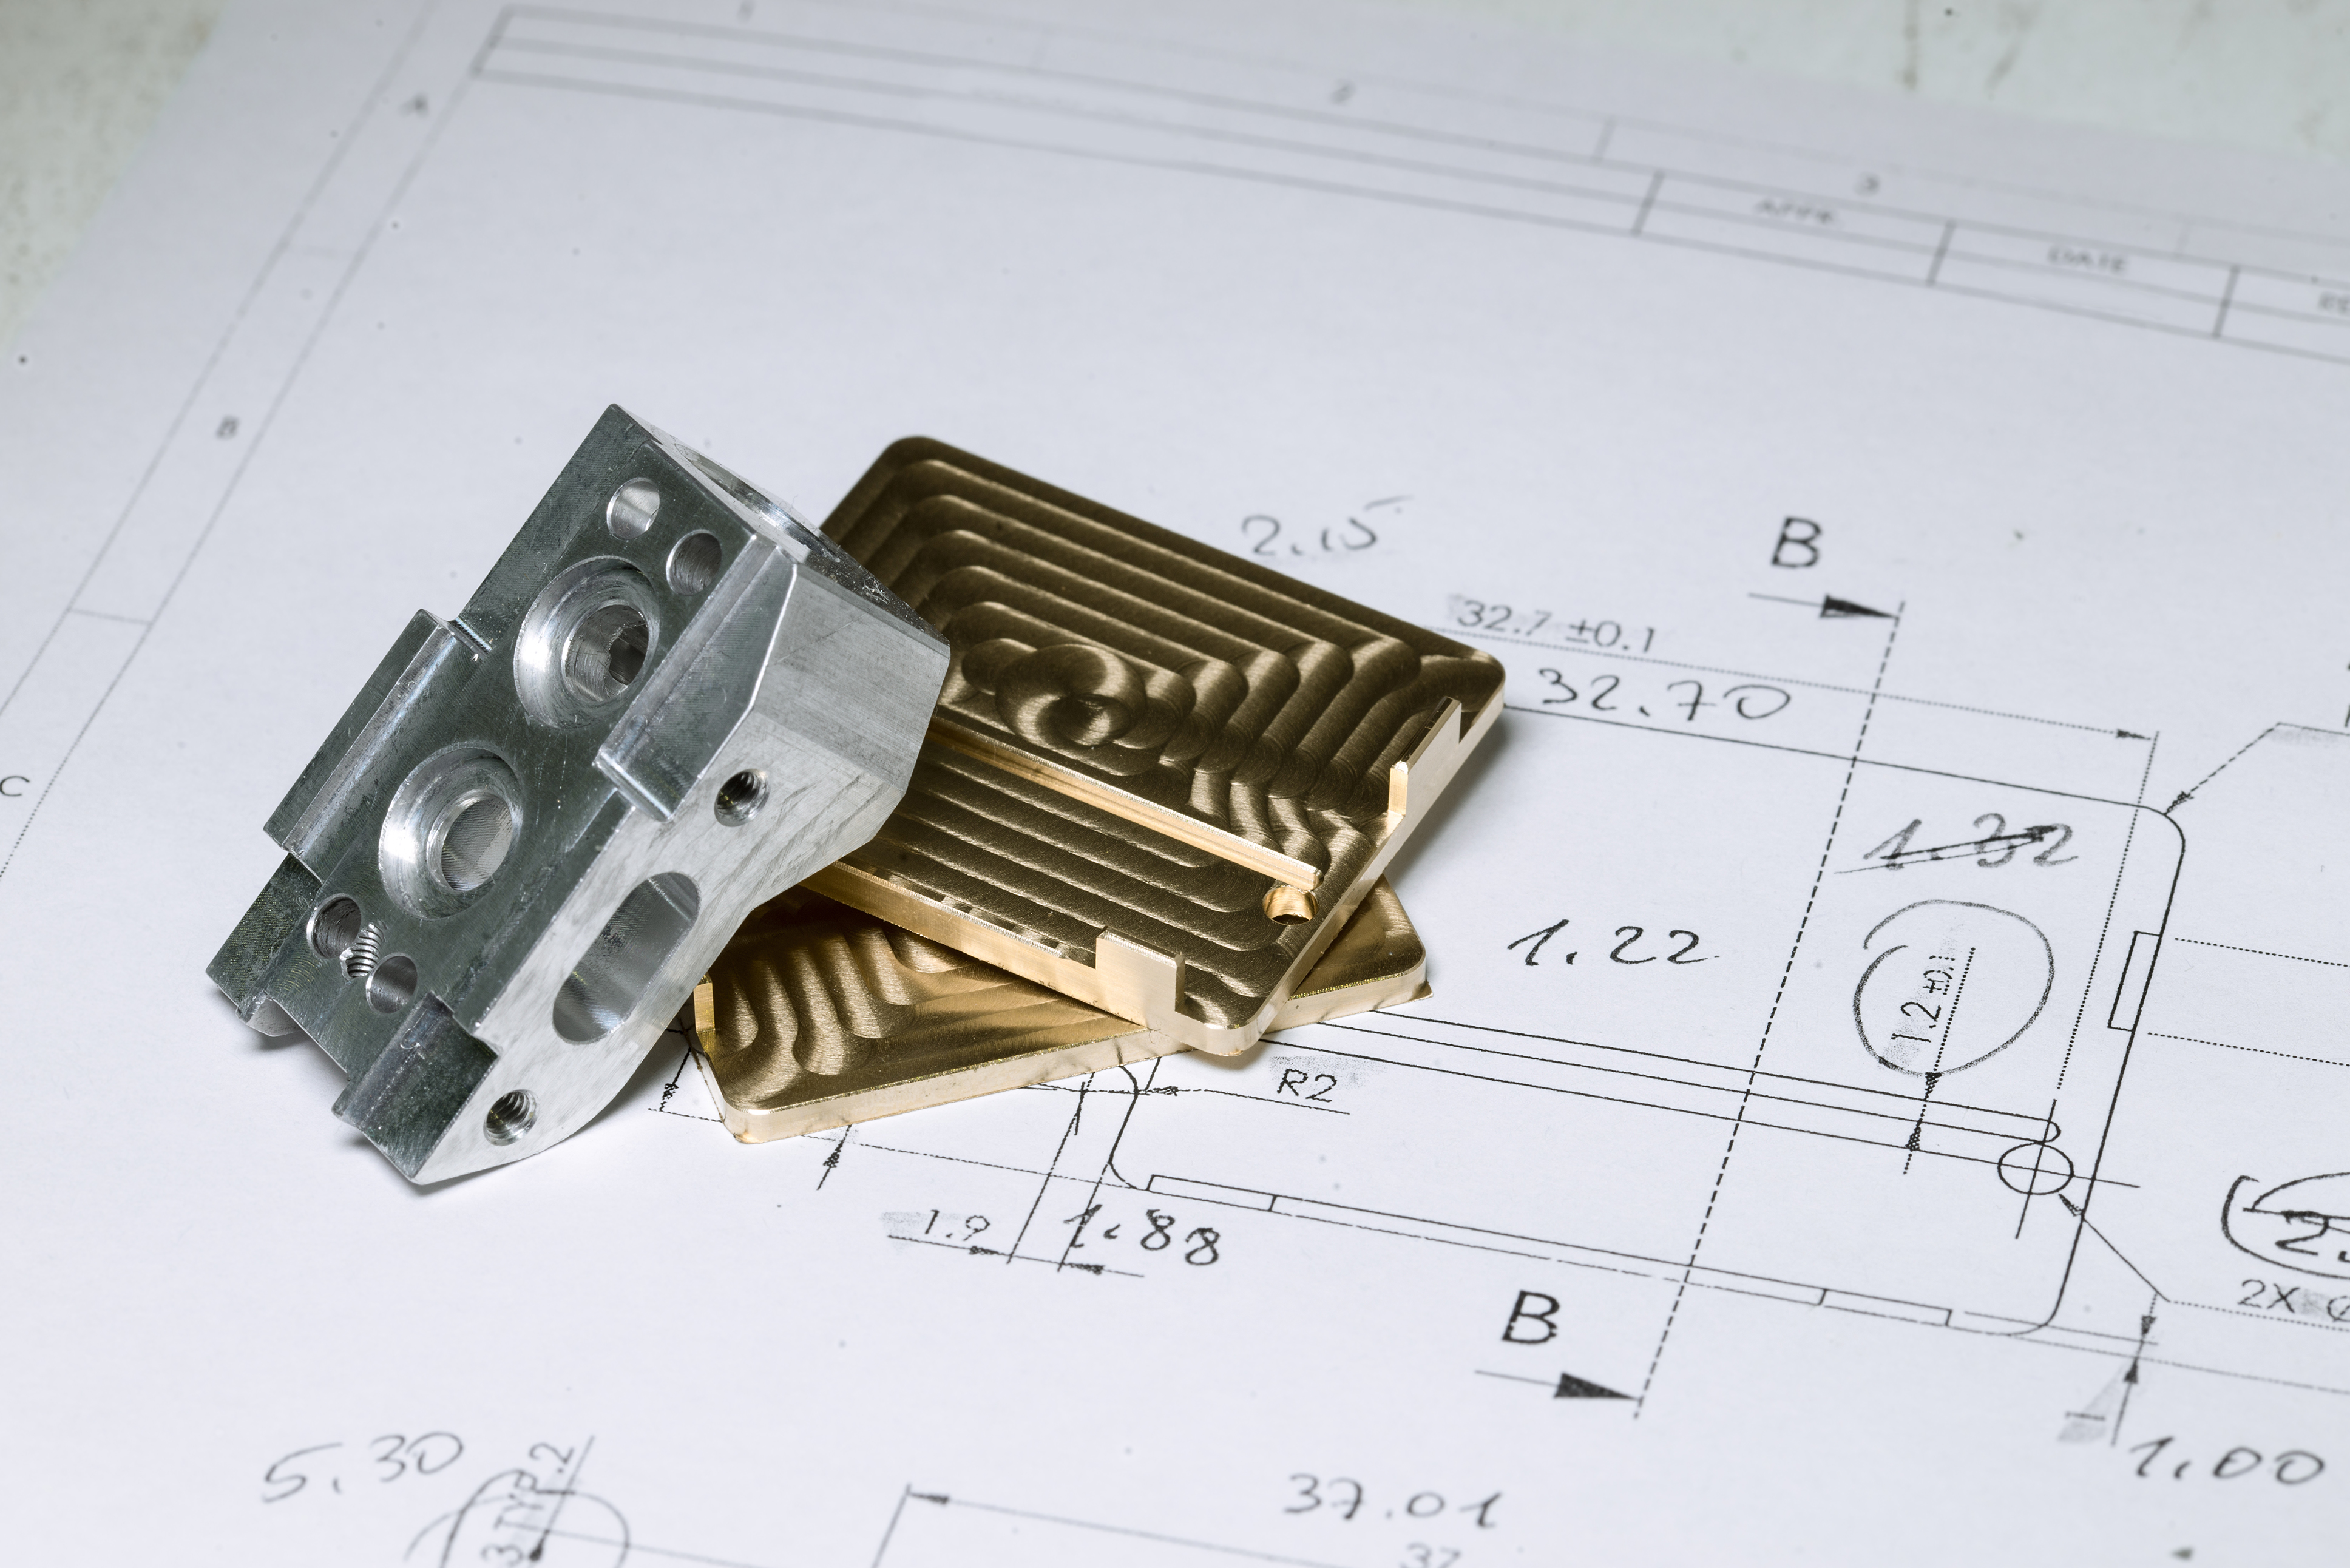 computer model of a parts mold